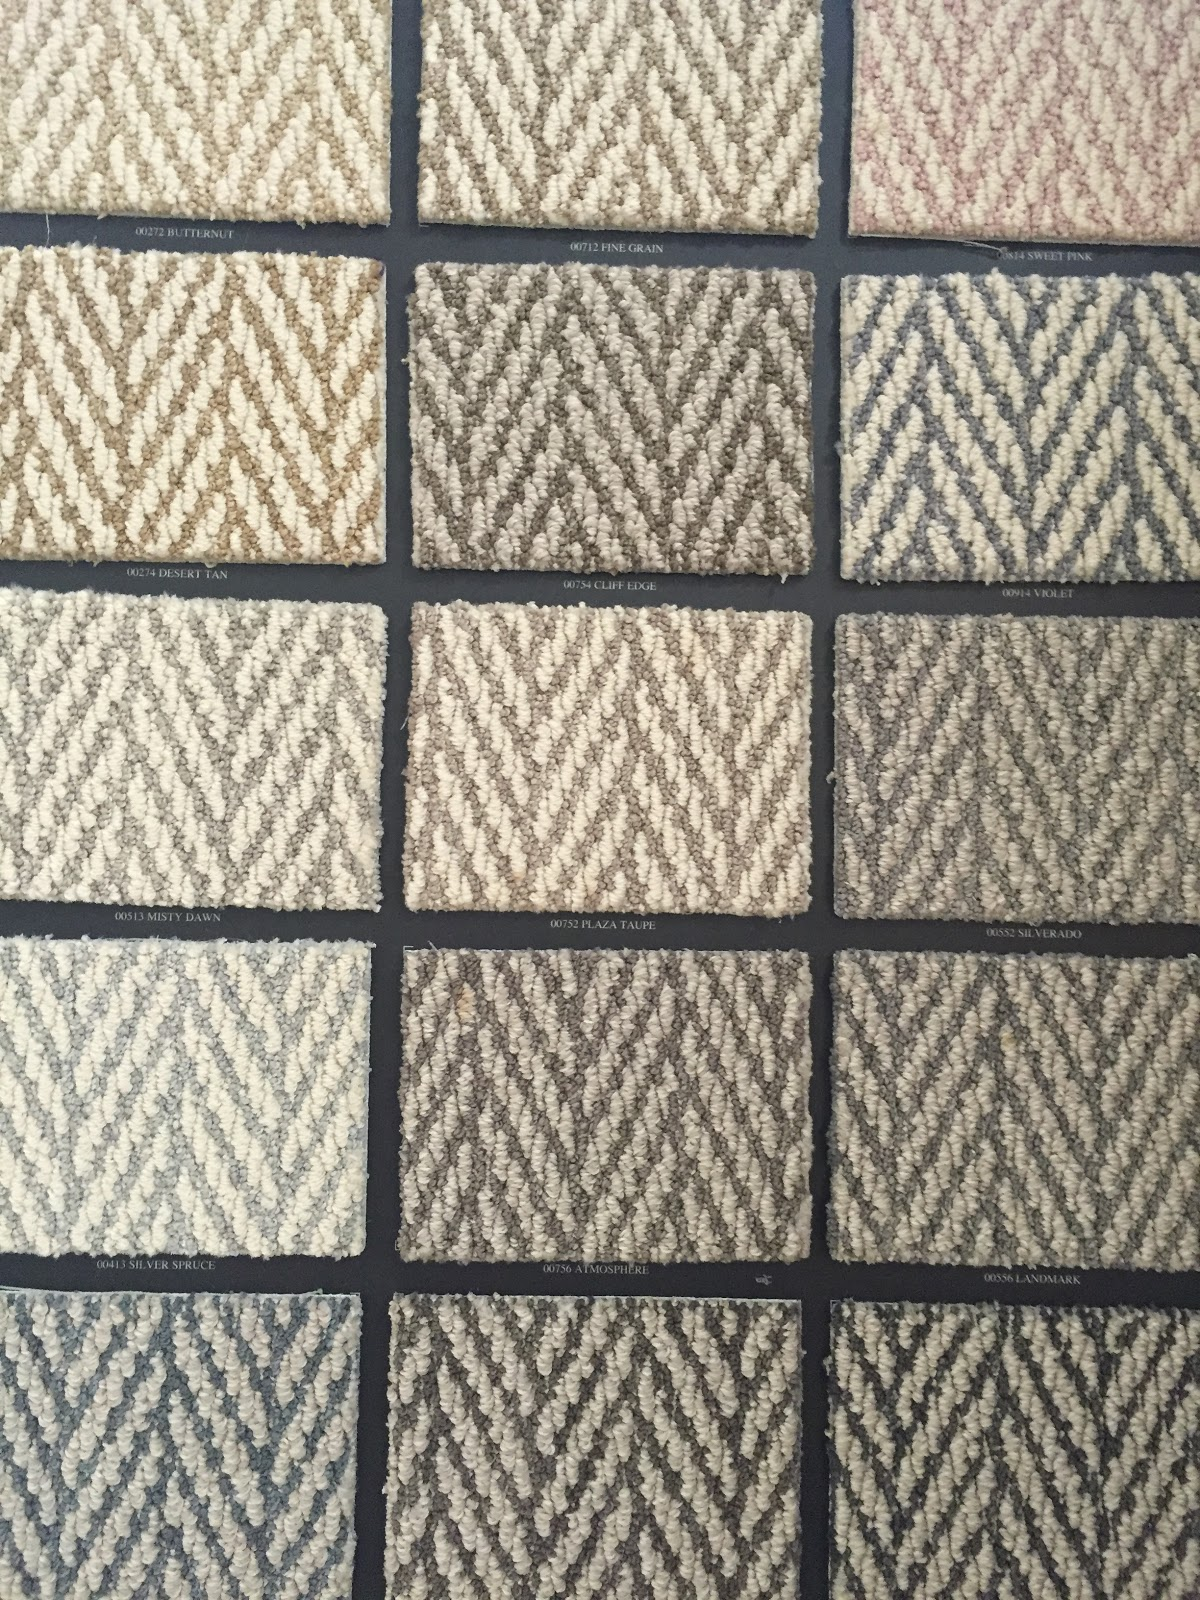 kitchen design software mac aid coffee grinder tuftex carpet only natural - vidalondon